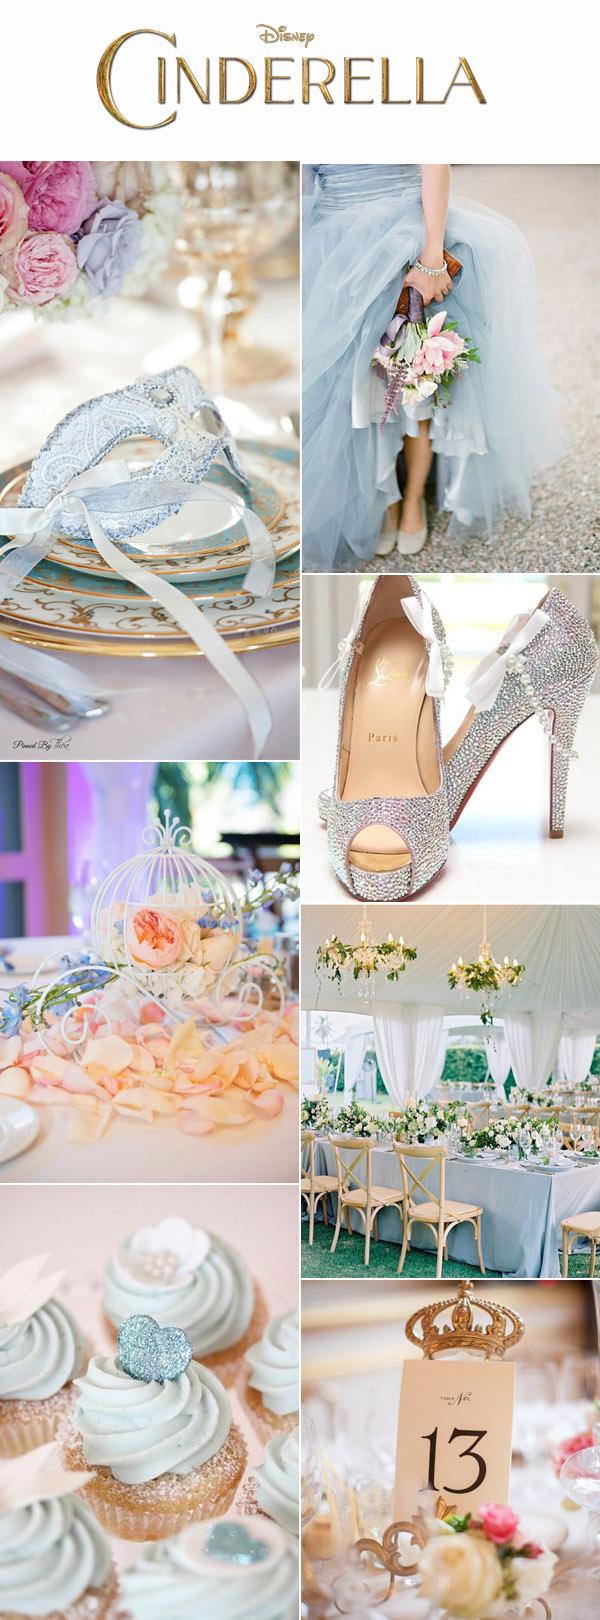 Fairytale Wedding Theme Ideas To Make Your Wedding